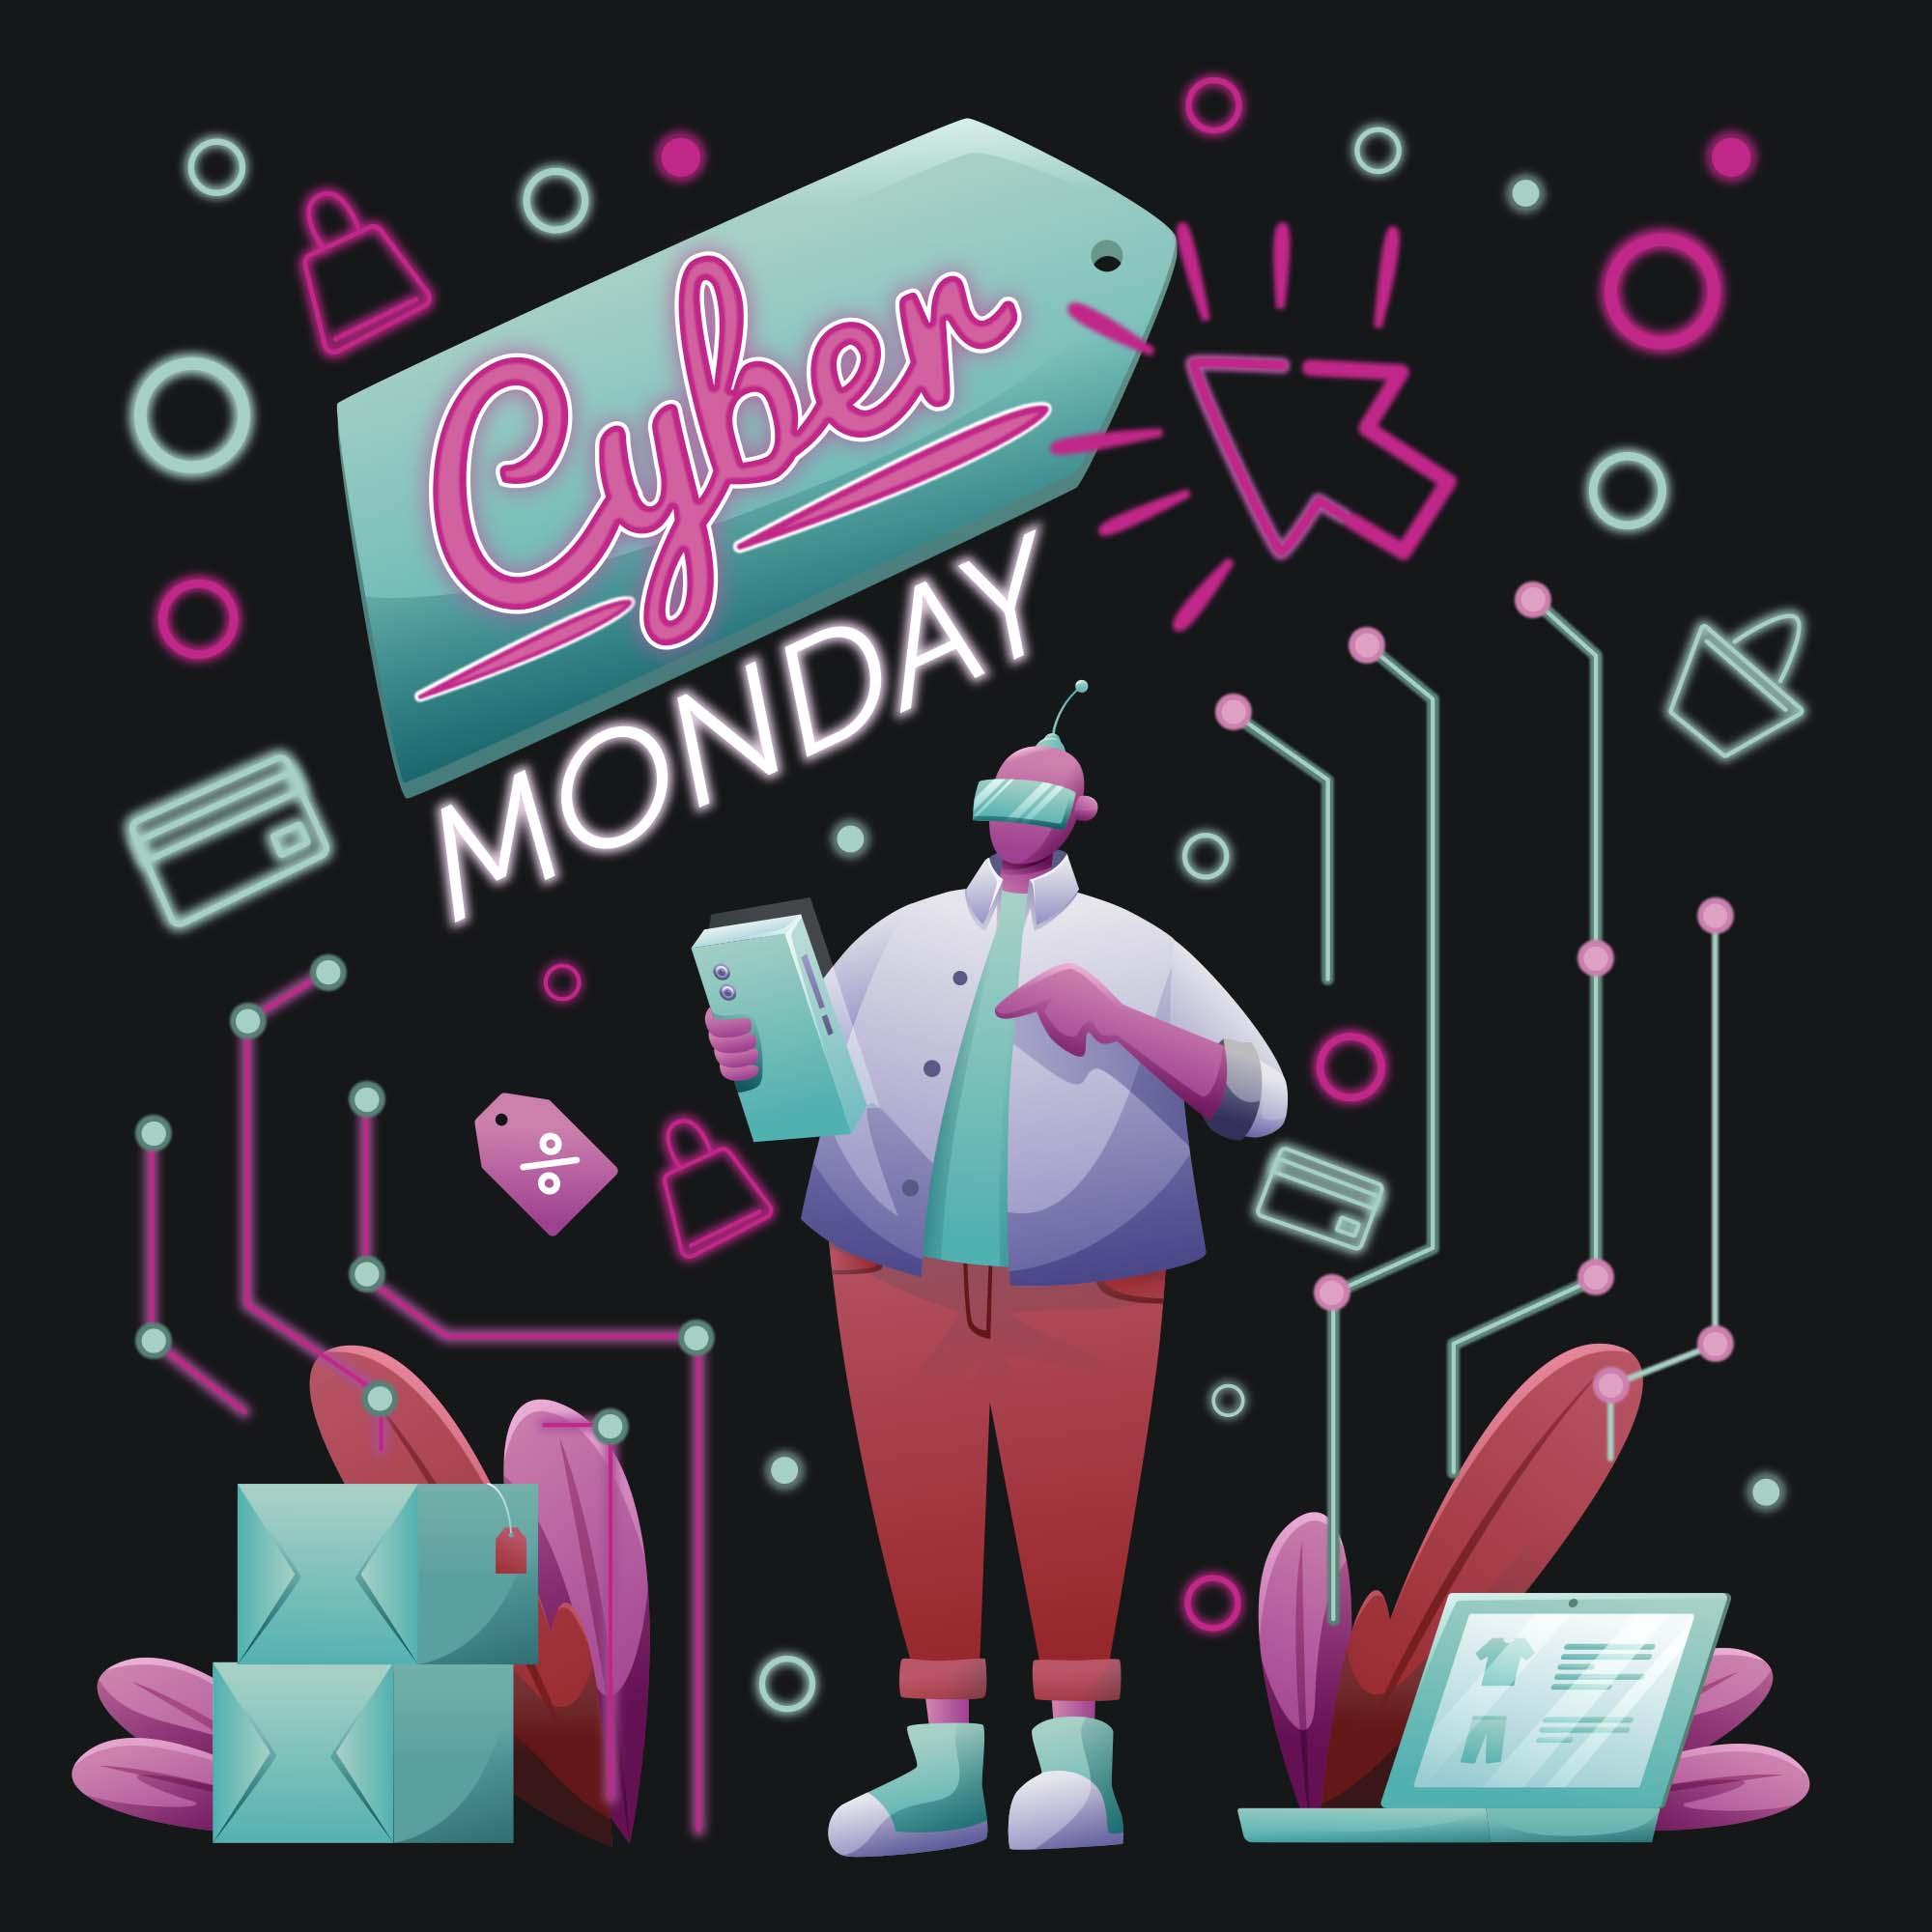 Cyber Monday Illustration